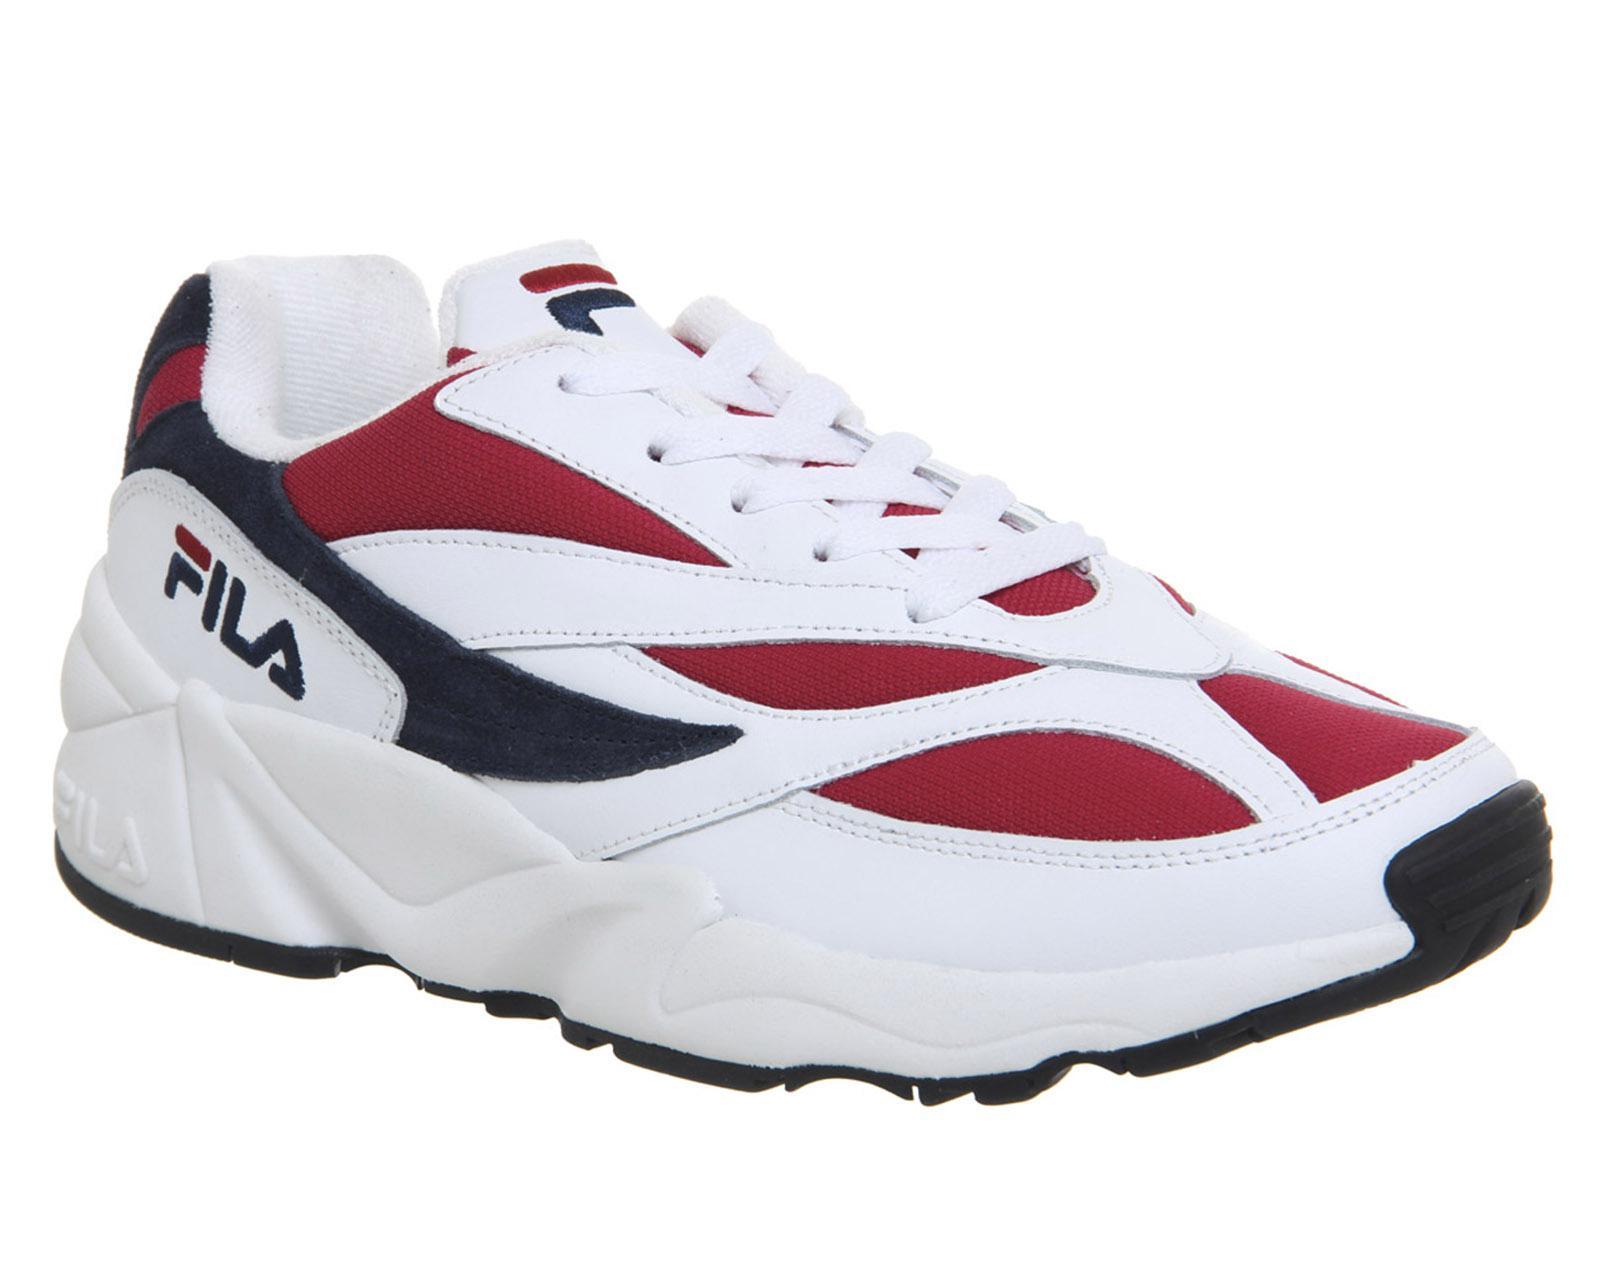 379c6adec34d Lyst - Fila Venum Low Trainers for Men